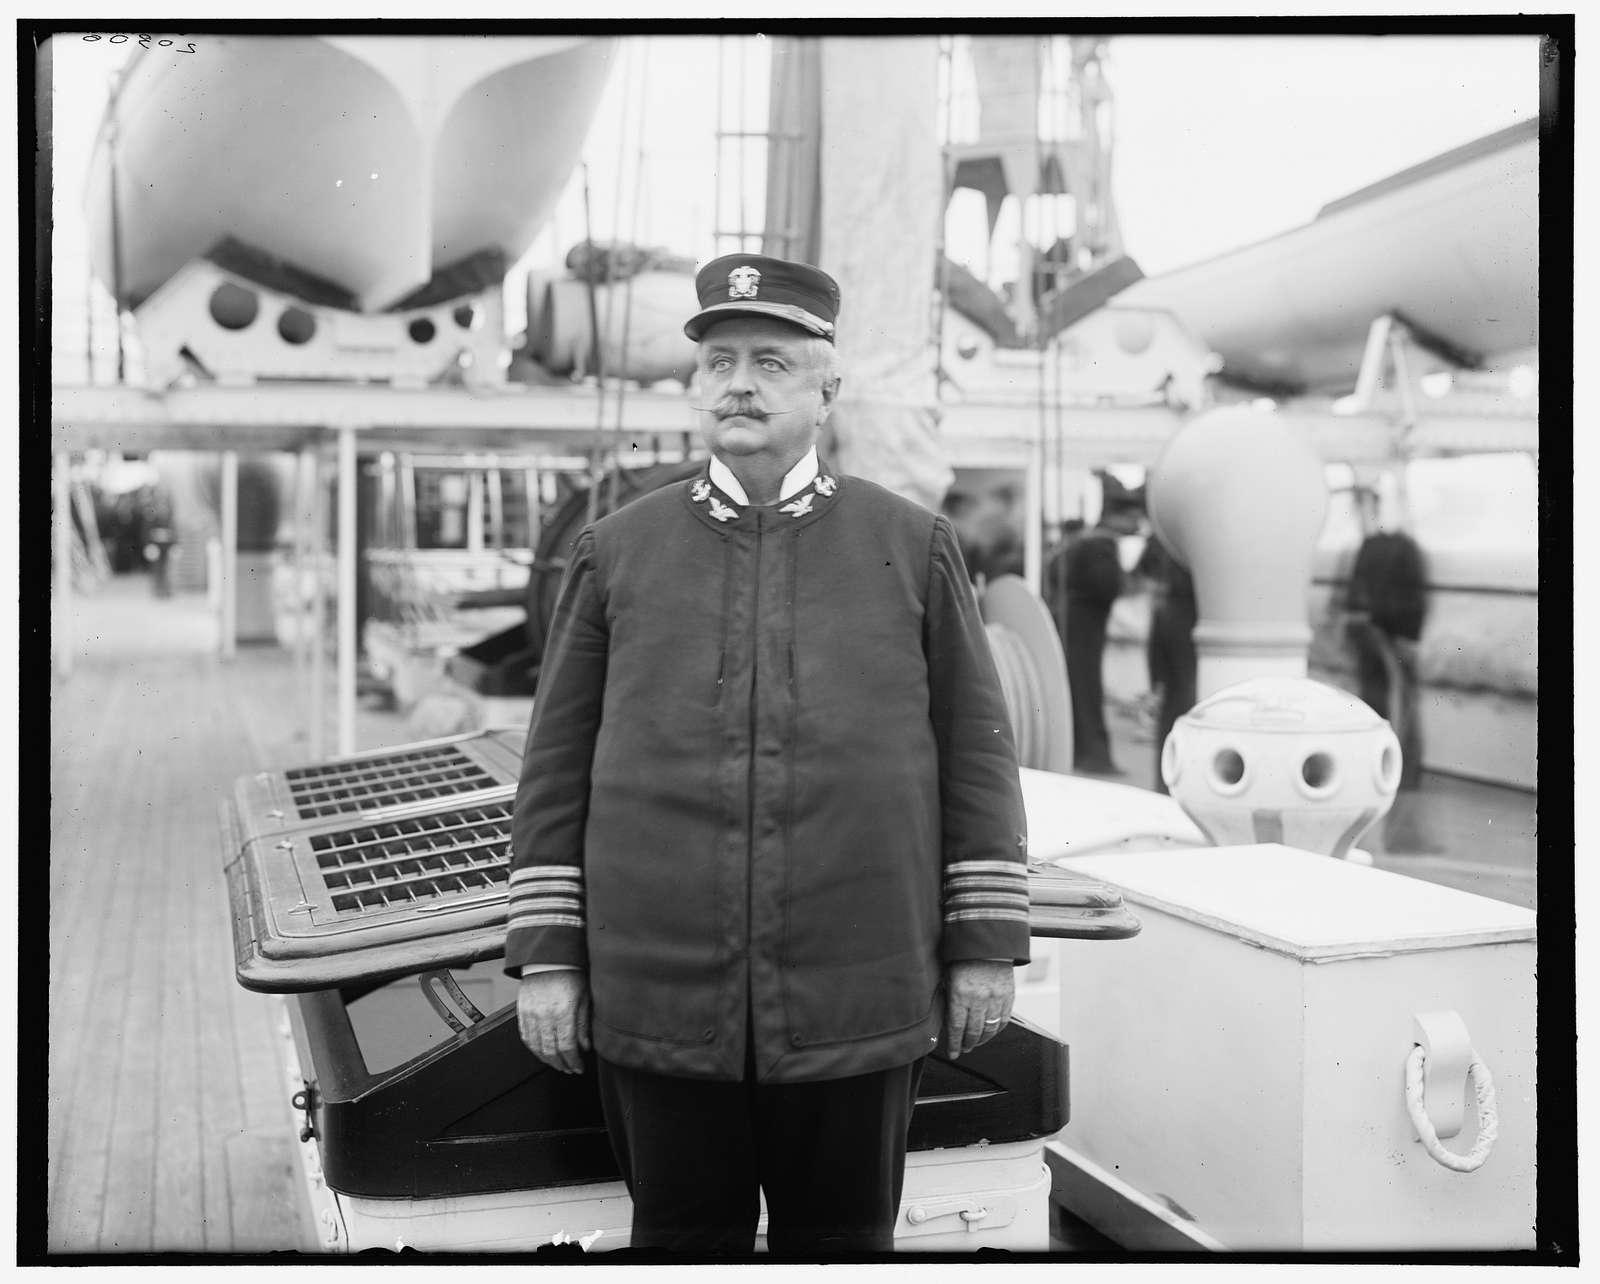 U.S.S. Chicago, Capt. Rockwell